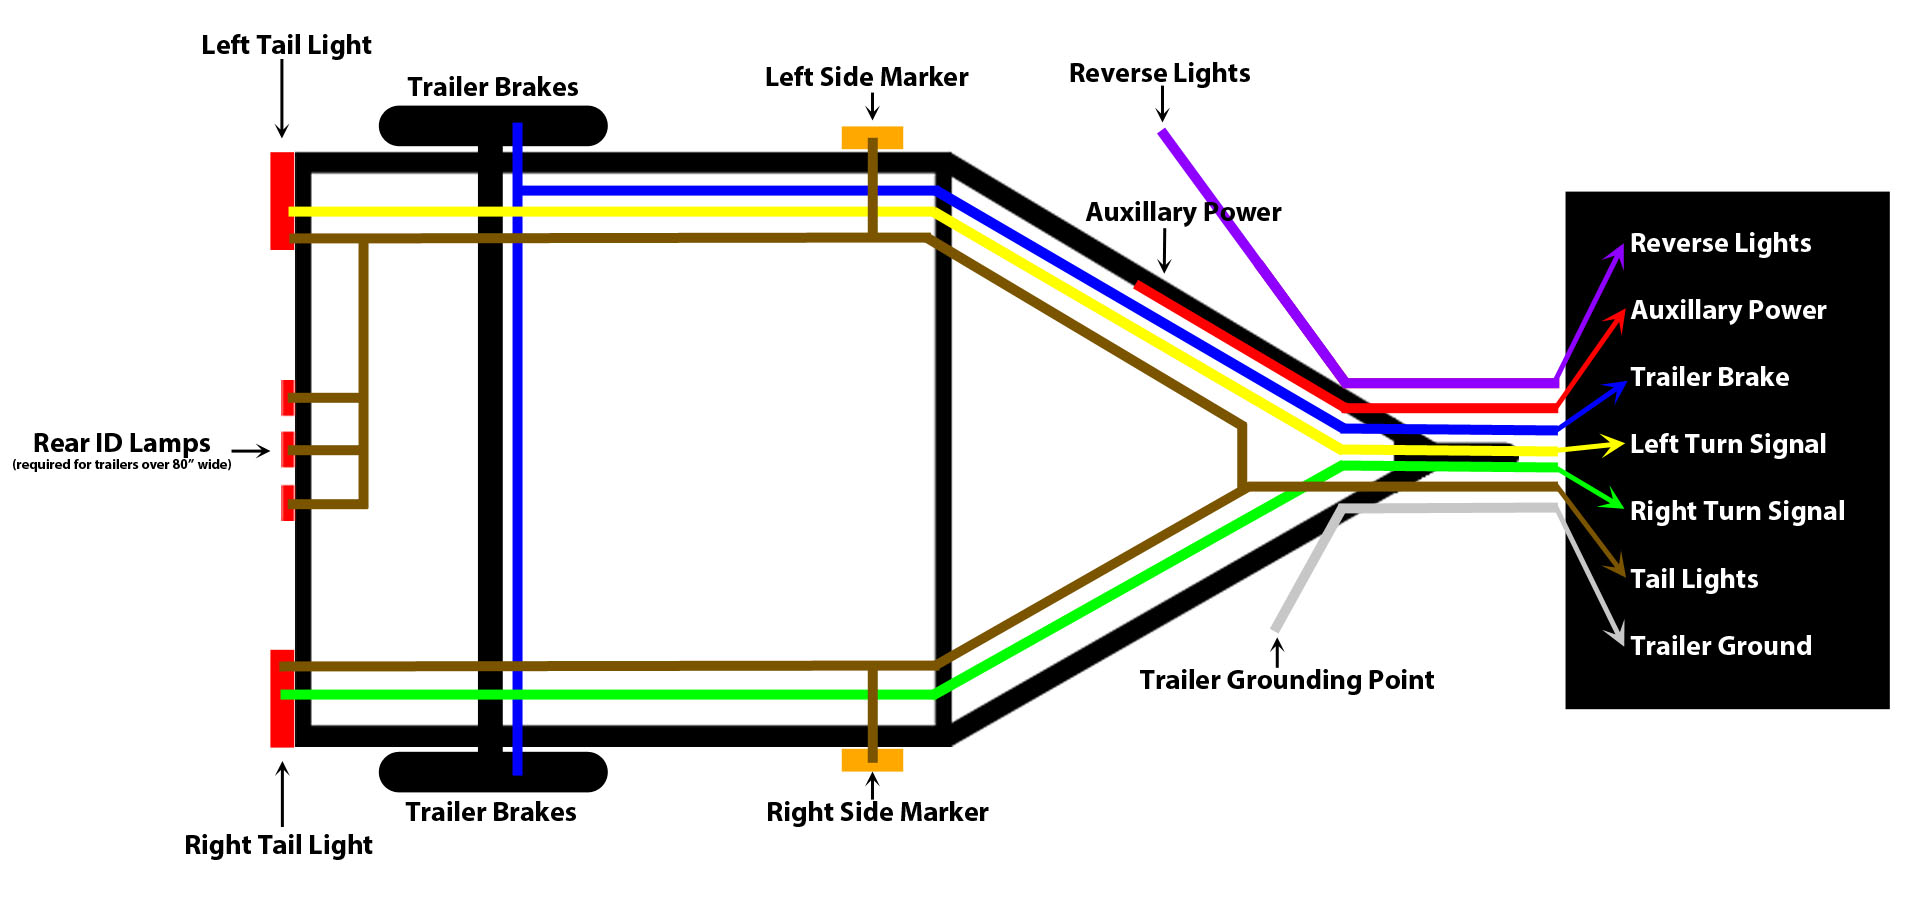 Diagram Car Trailer Wiring Diagram Full Version Hd Quality Wiring Diagram Bpmndiagrams Portoturisticodilovere It